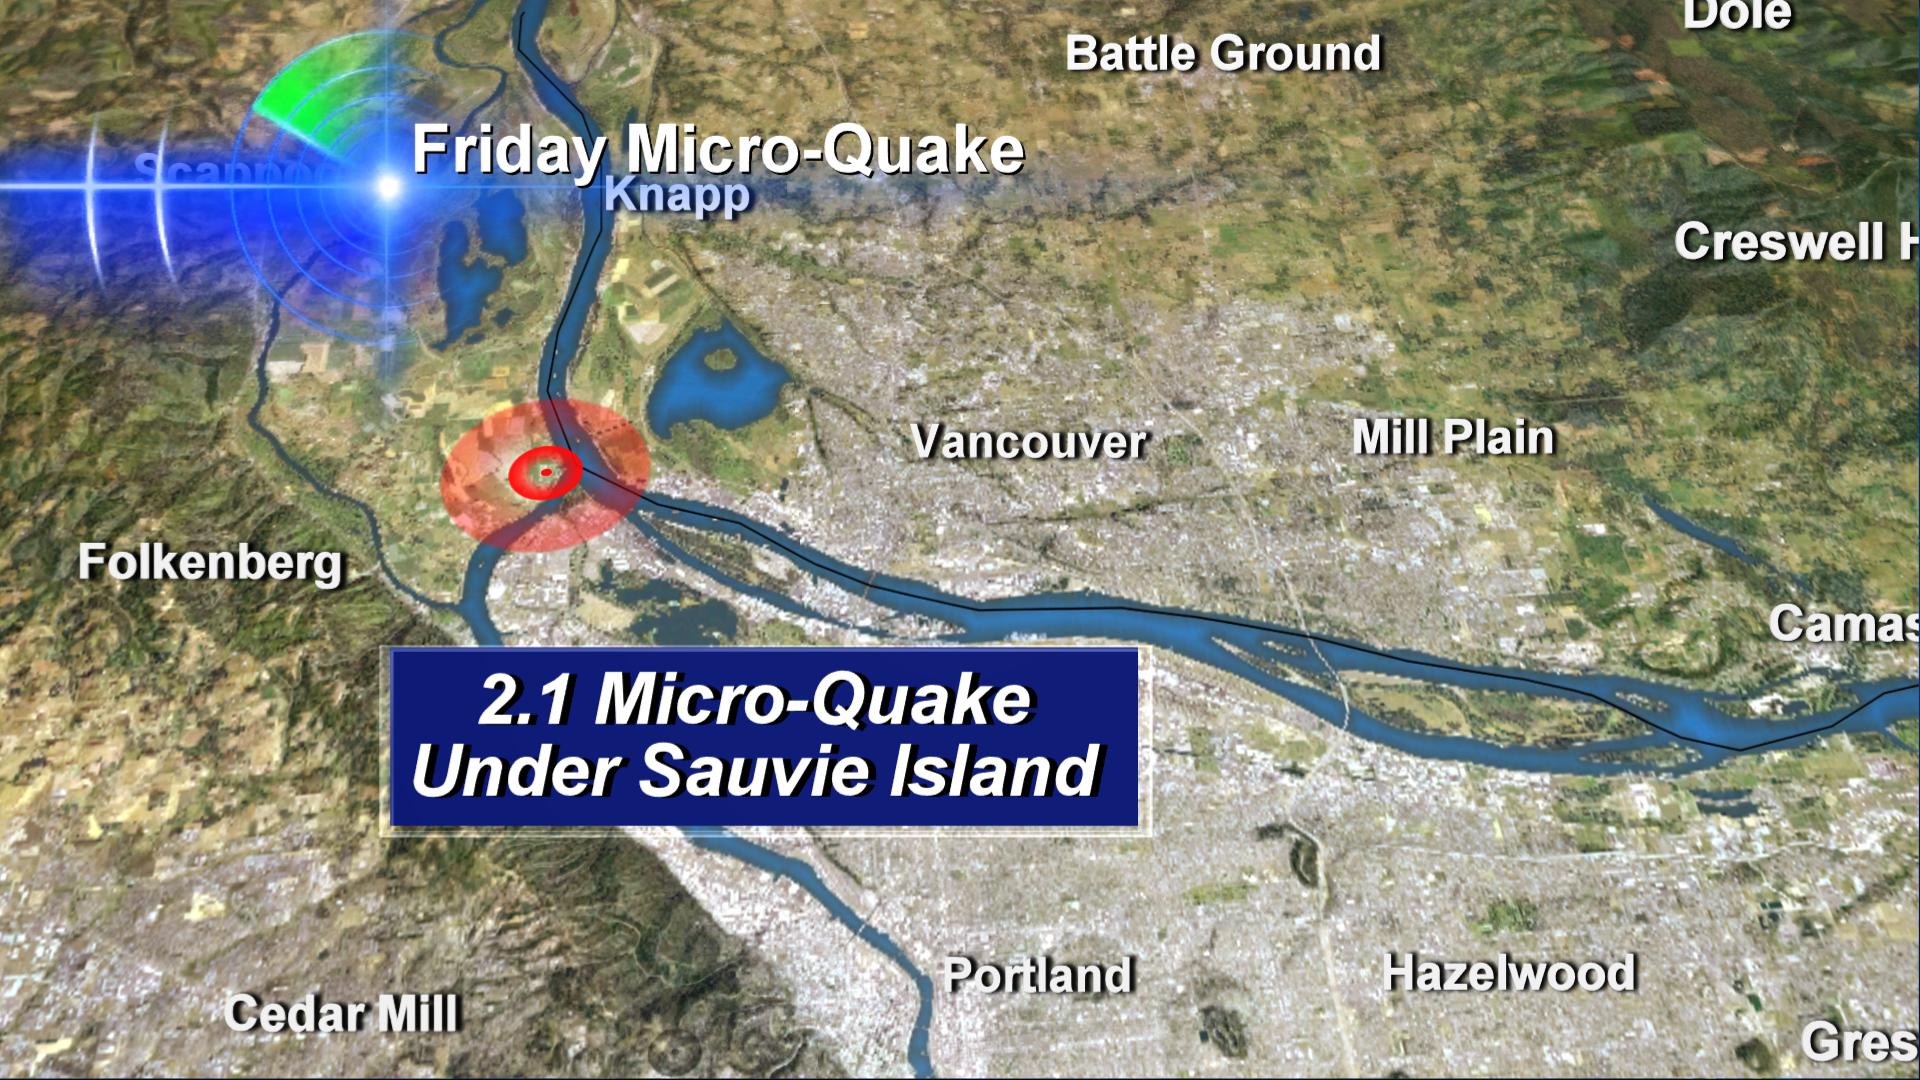 Medium Sized Earthquakes In Oregon & Washington: Eerily Quiet